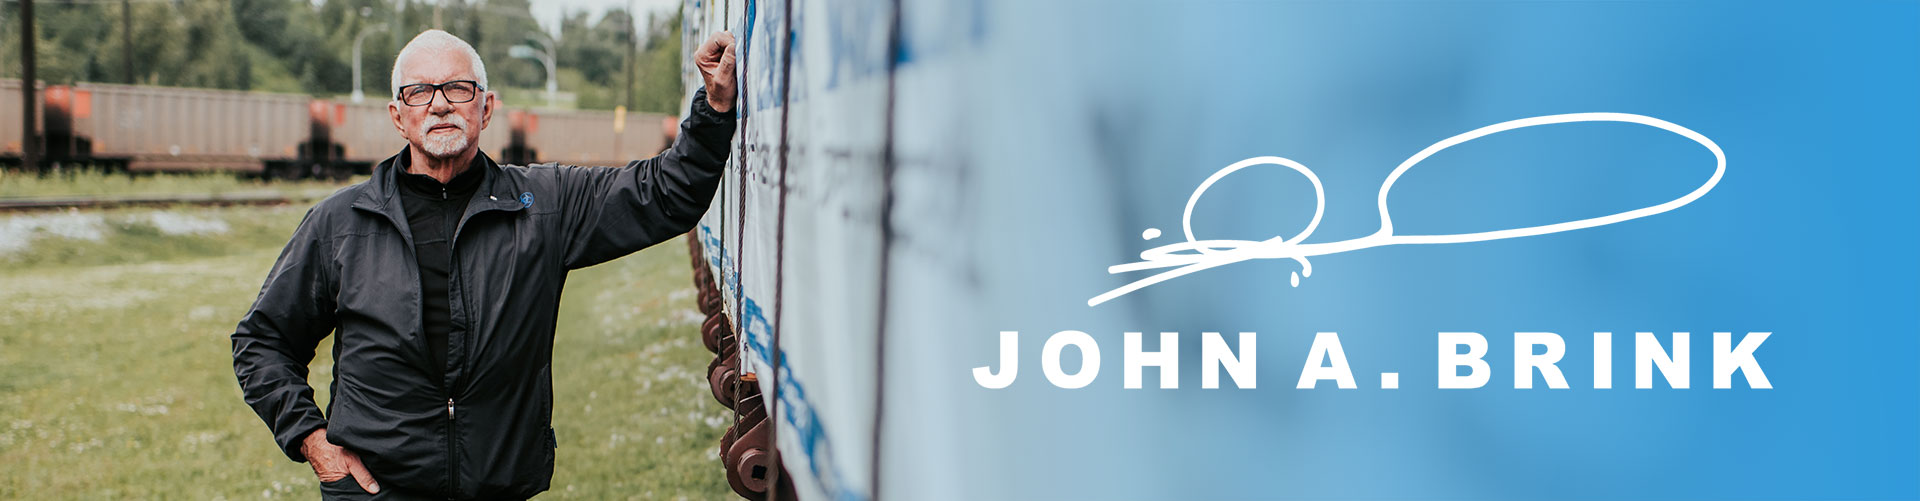 John A Brink - About Page Header HD